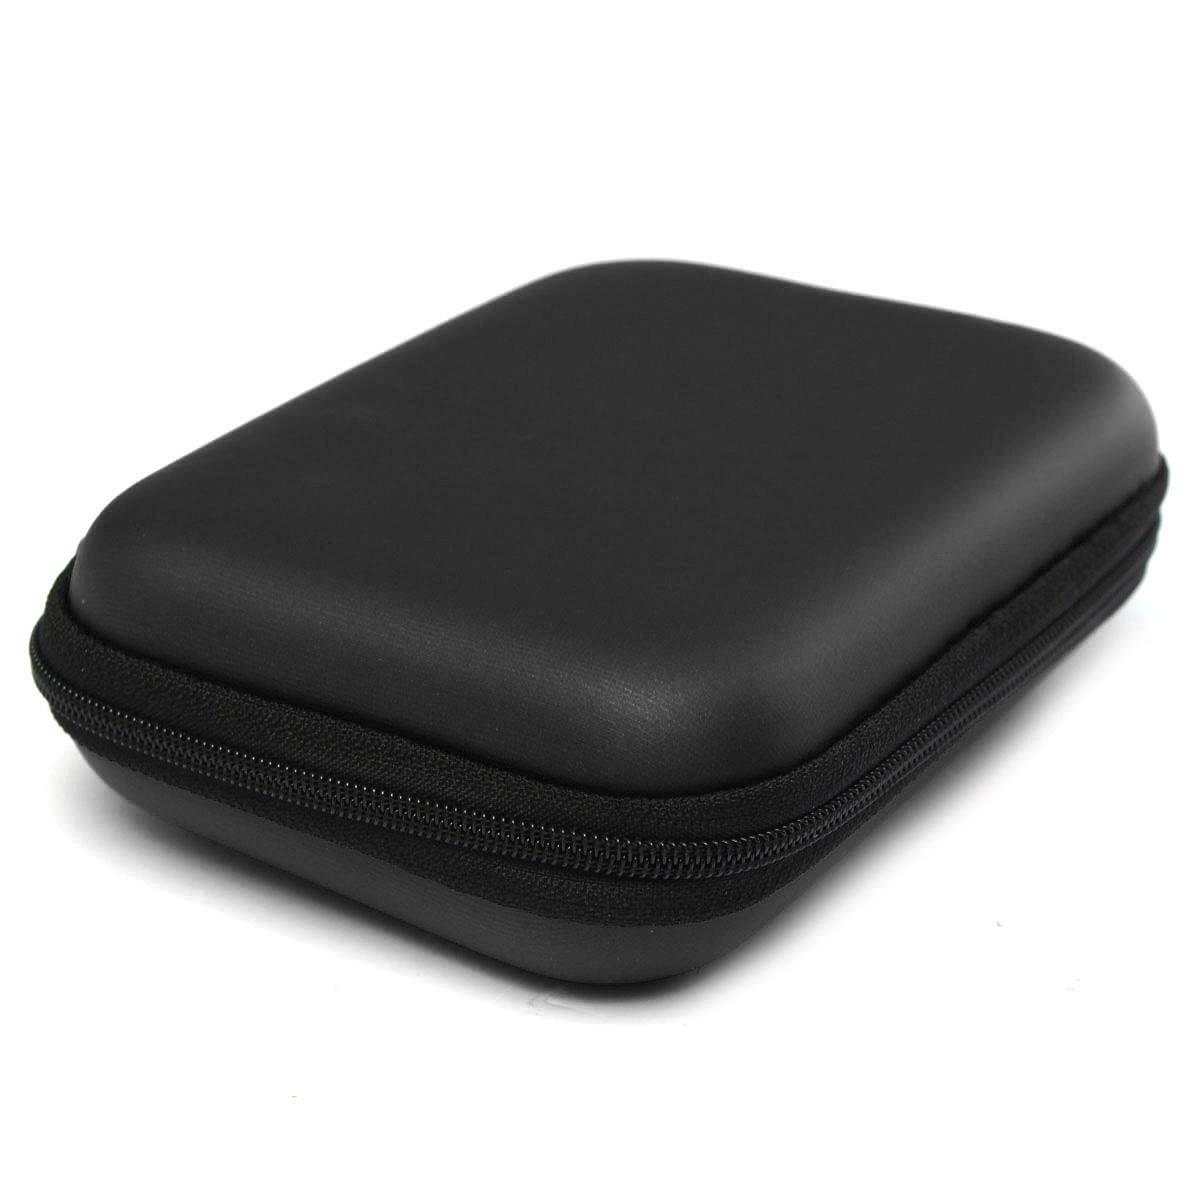 Case Cover For 25 USB External Hard Disk